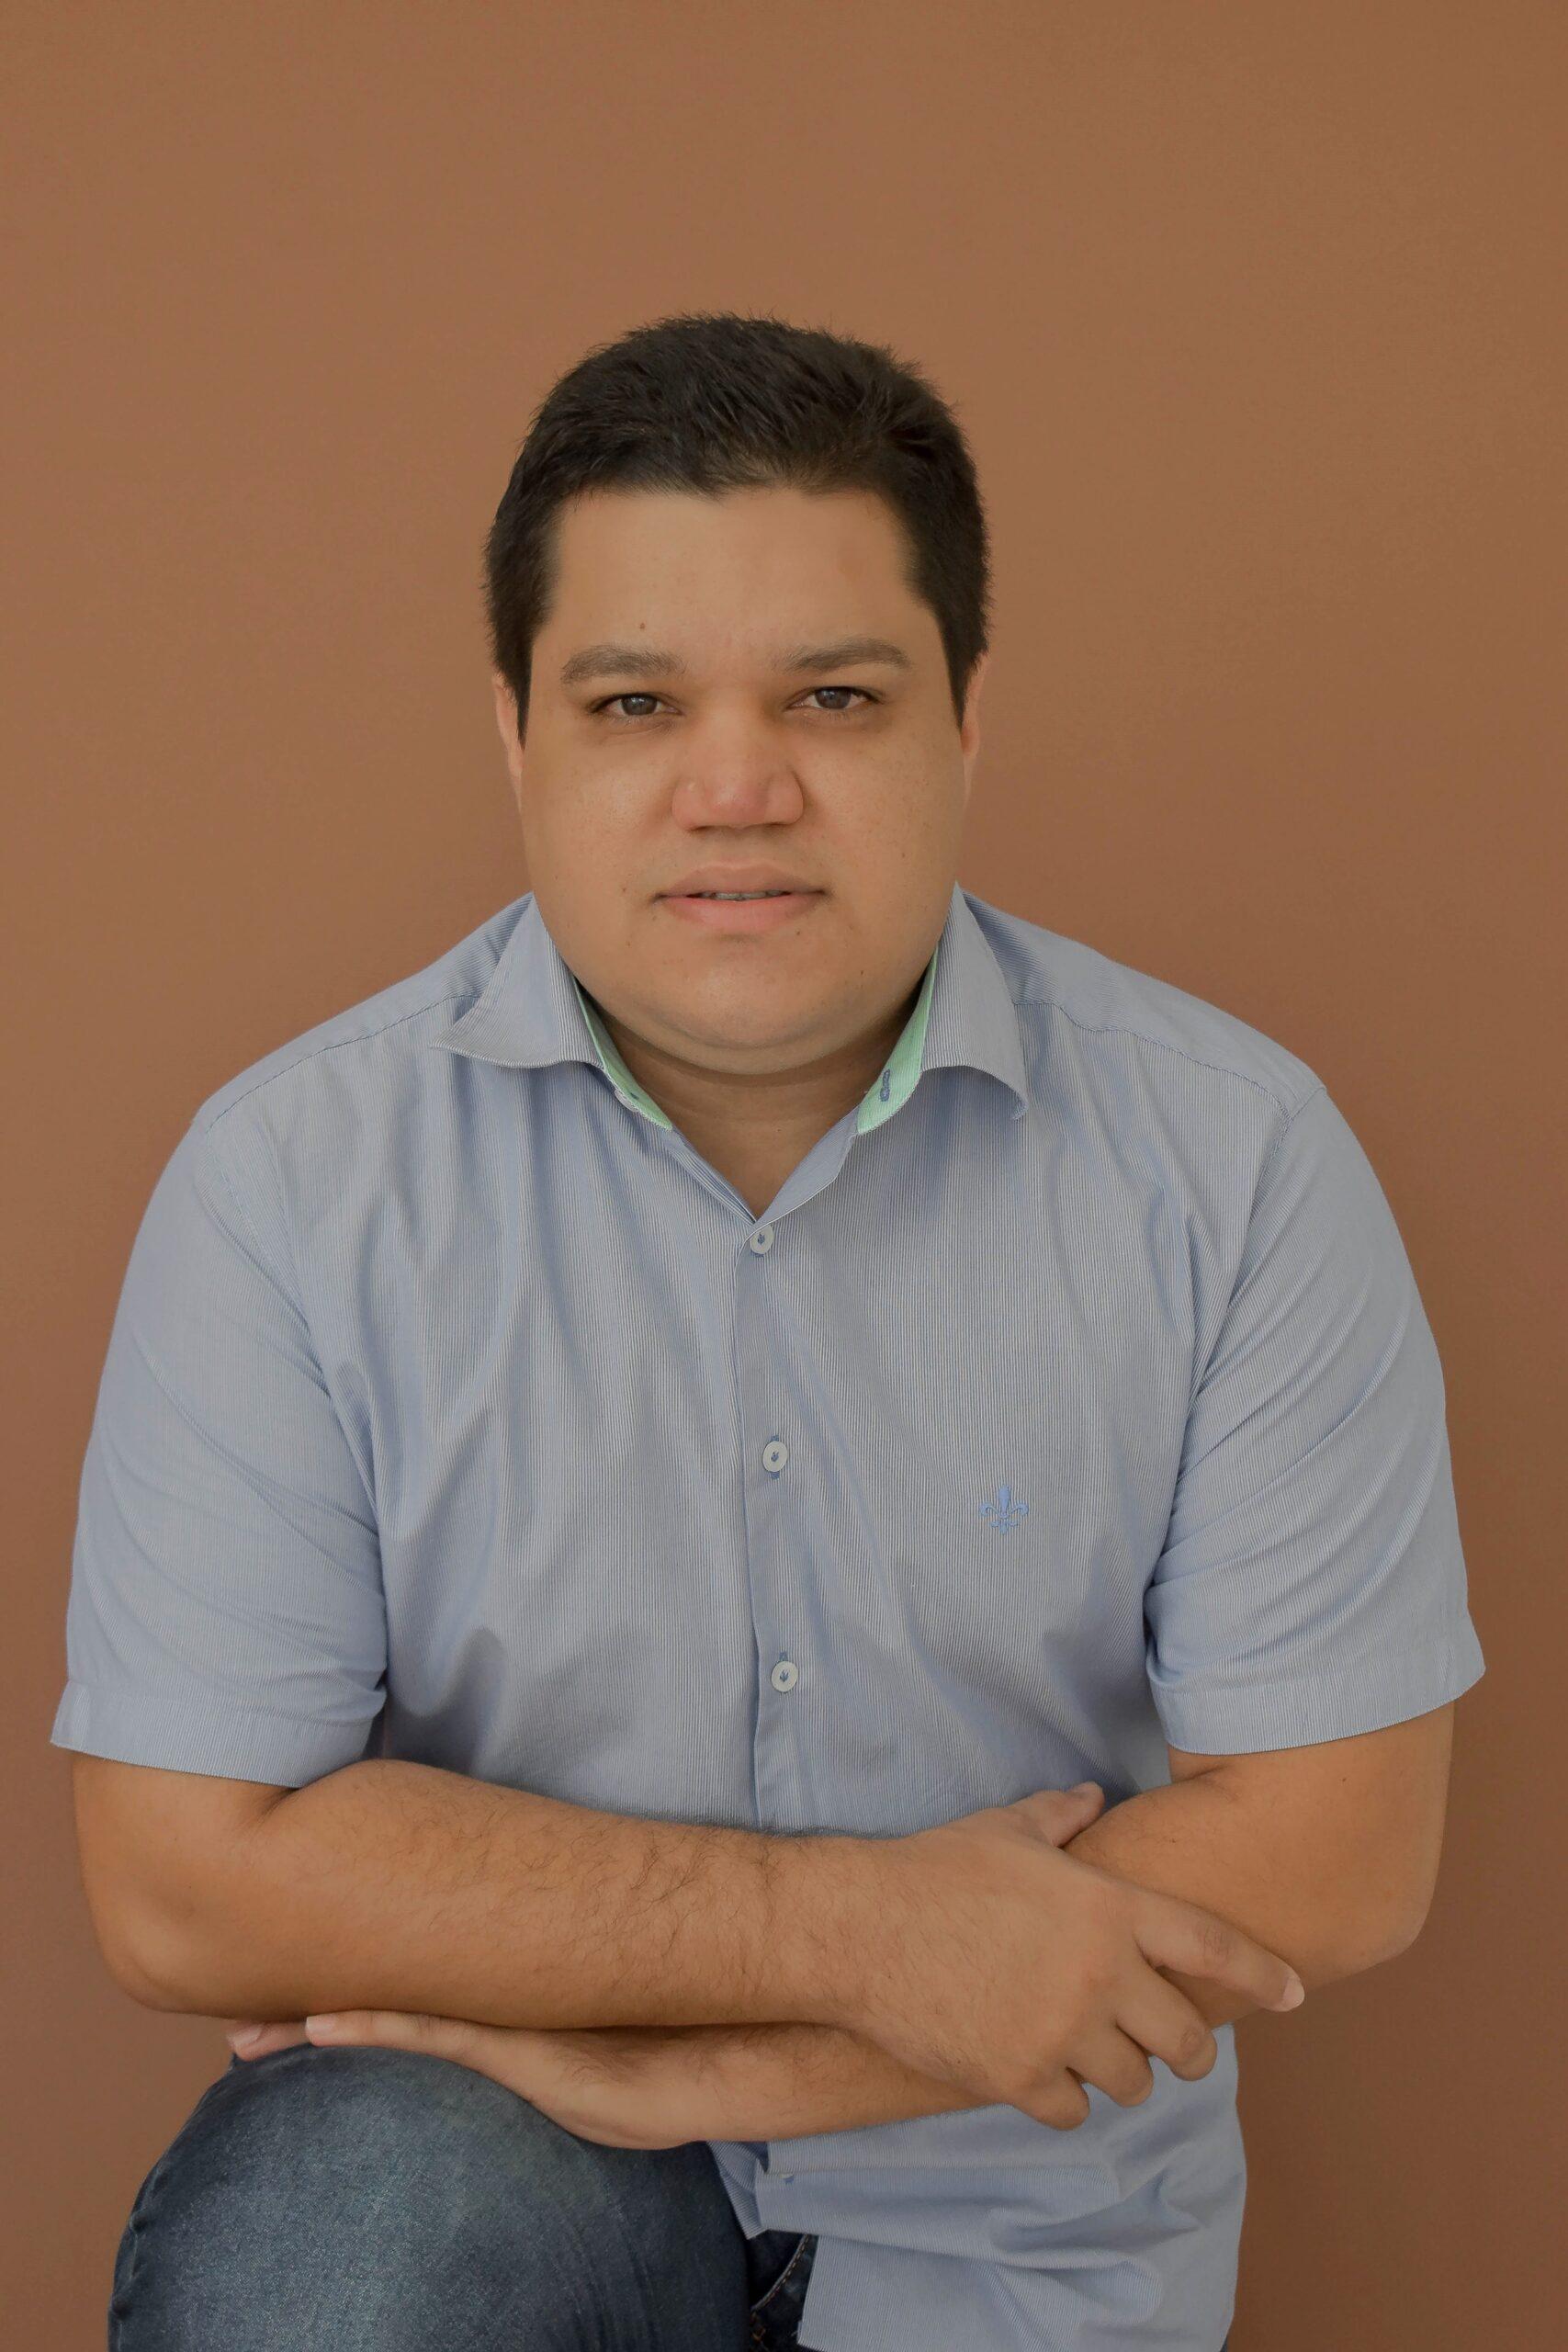 Foto Perfil Hellisson Fernandes Batista